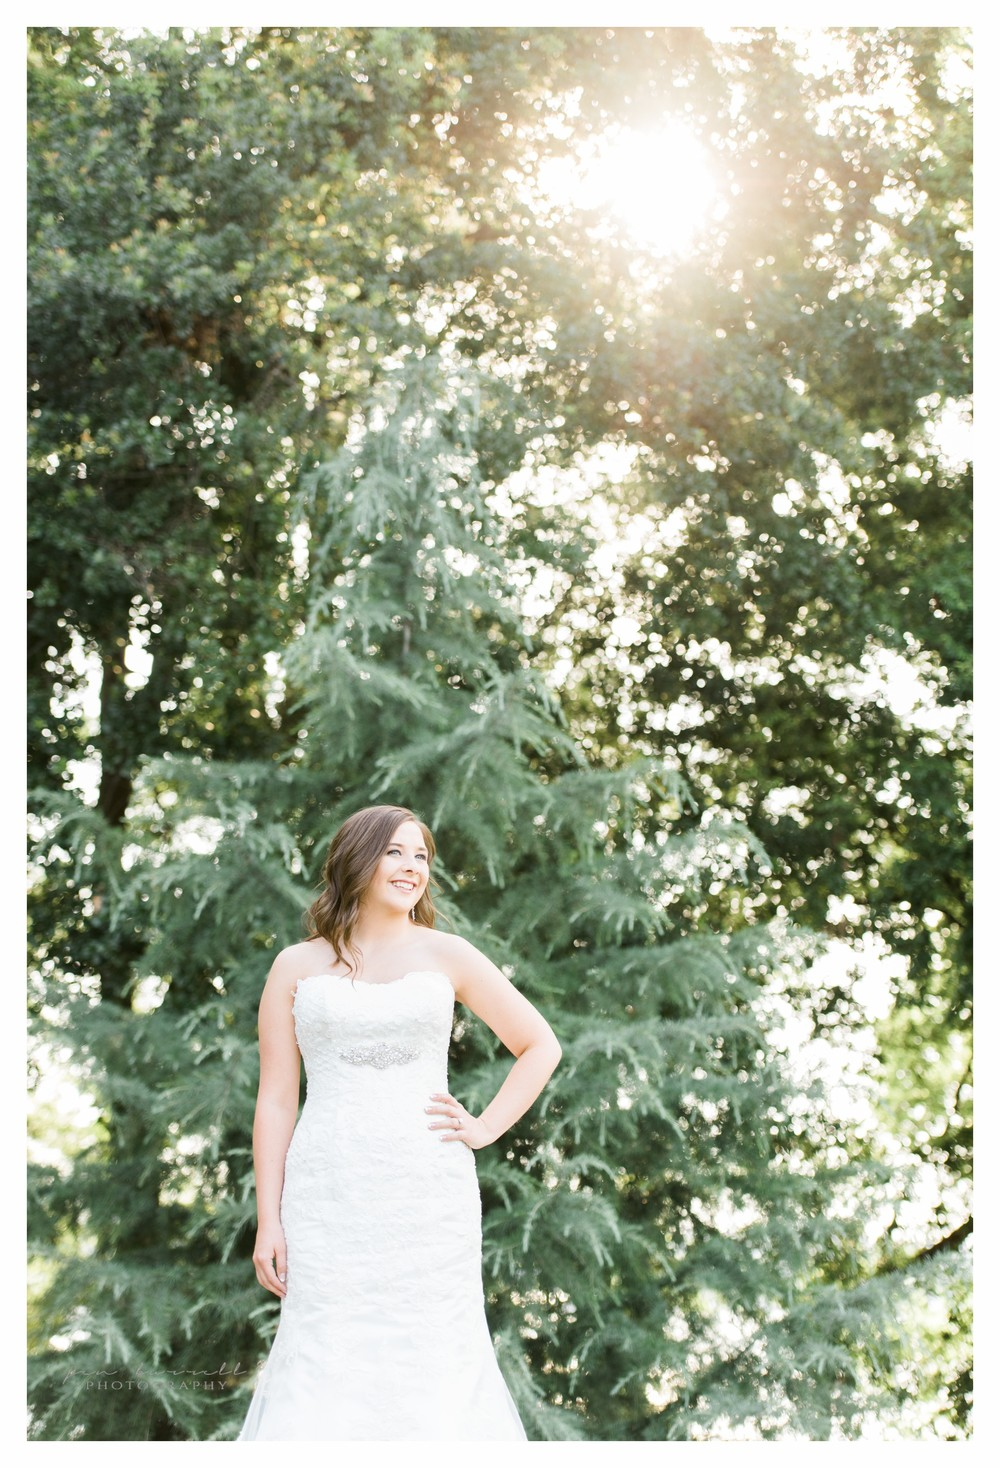 Bridal Session Blog 7.jpg